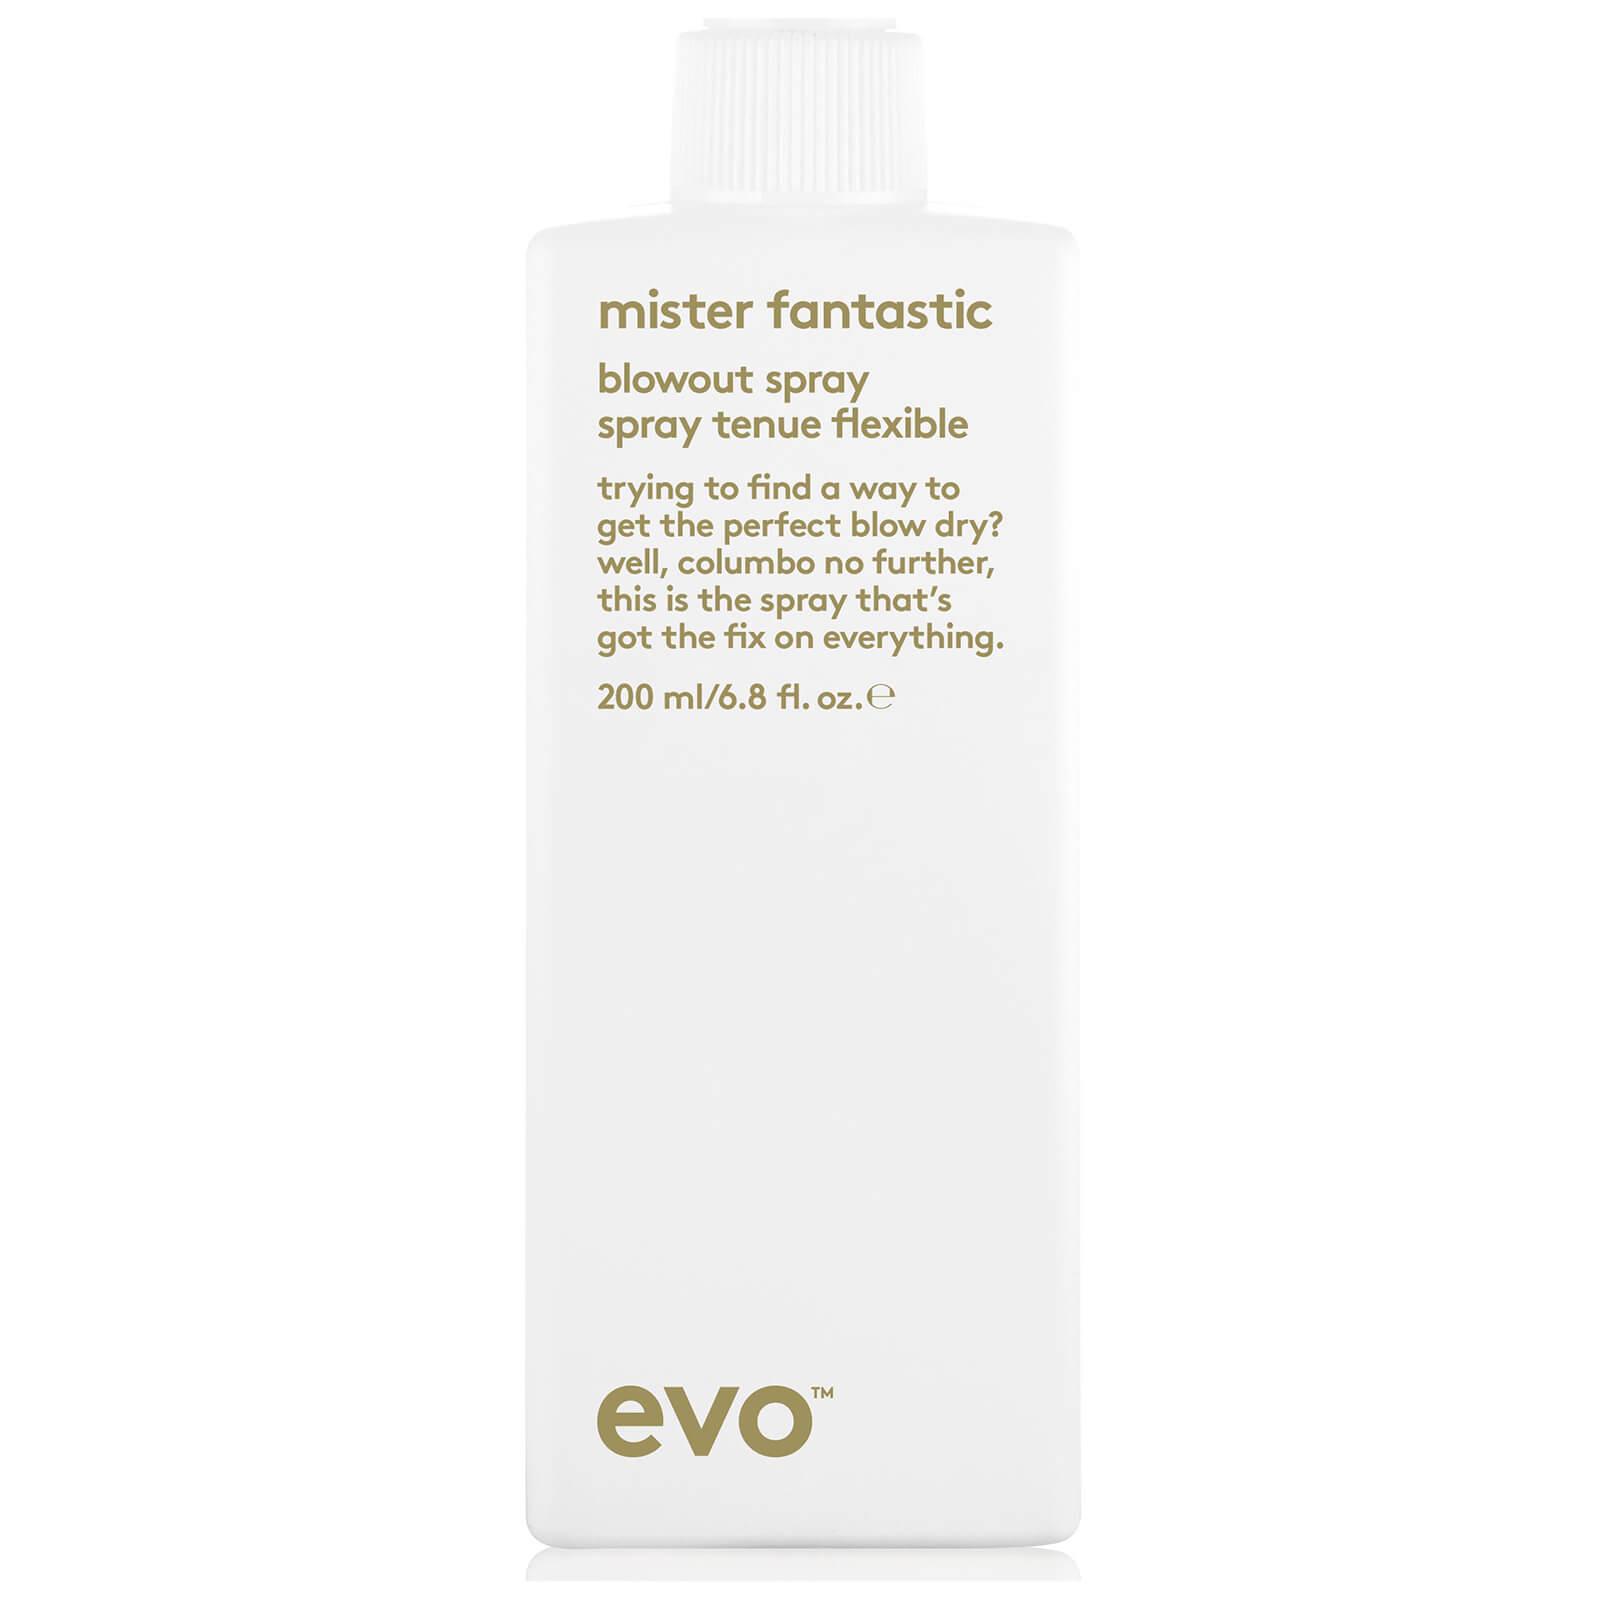 Купить Evo Mister Fantastic Blowout Spray 200ml